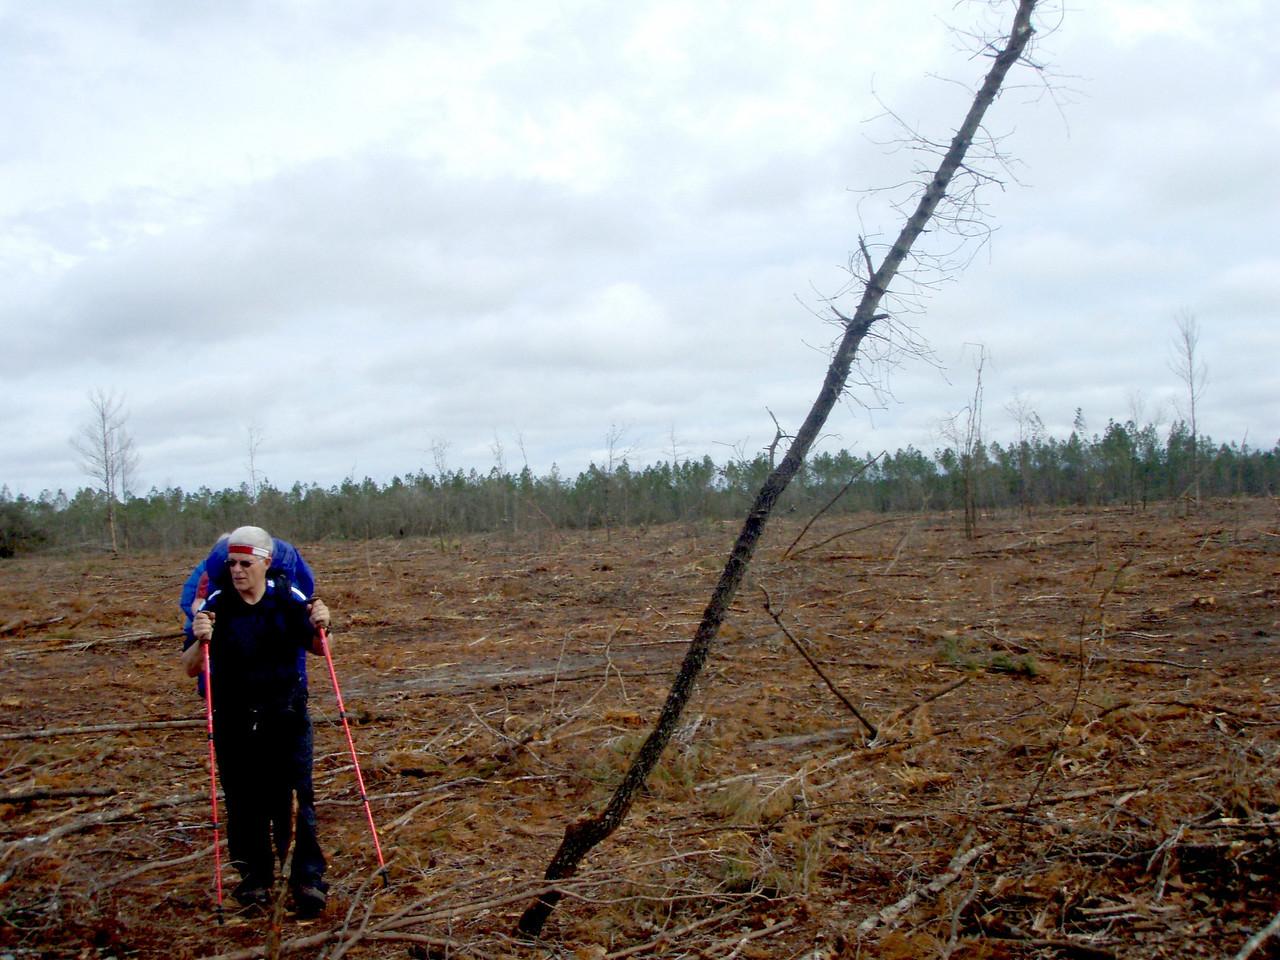 Stump makes it across the restoration clear cut.